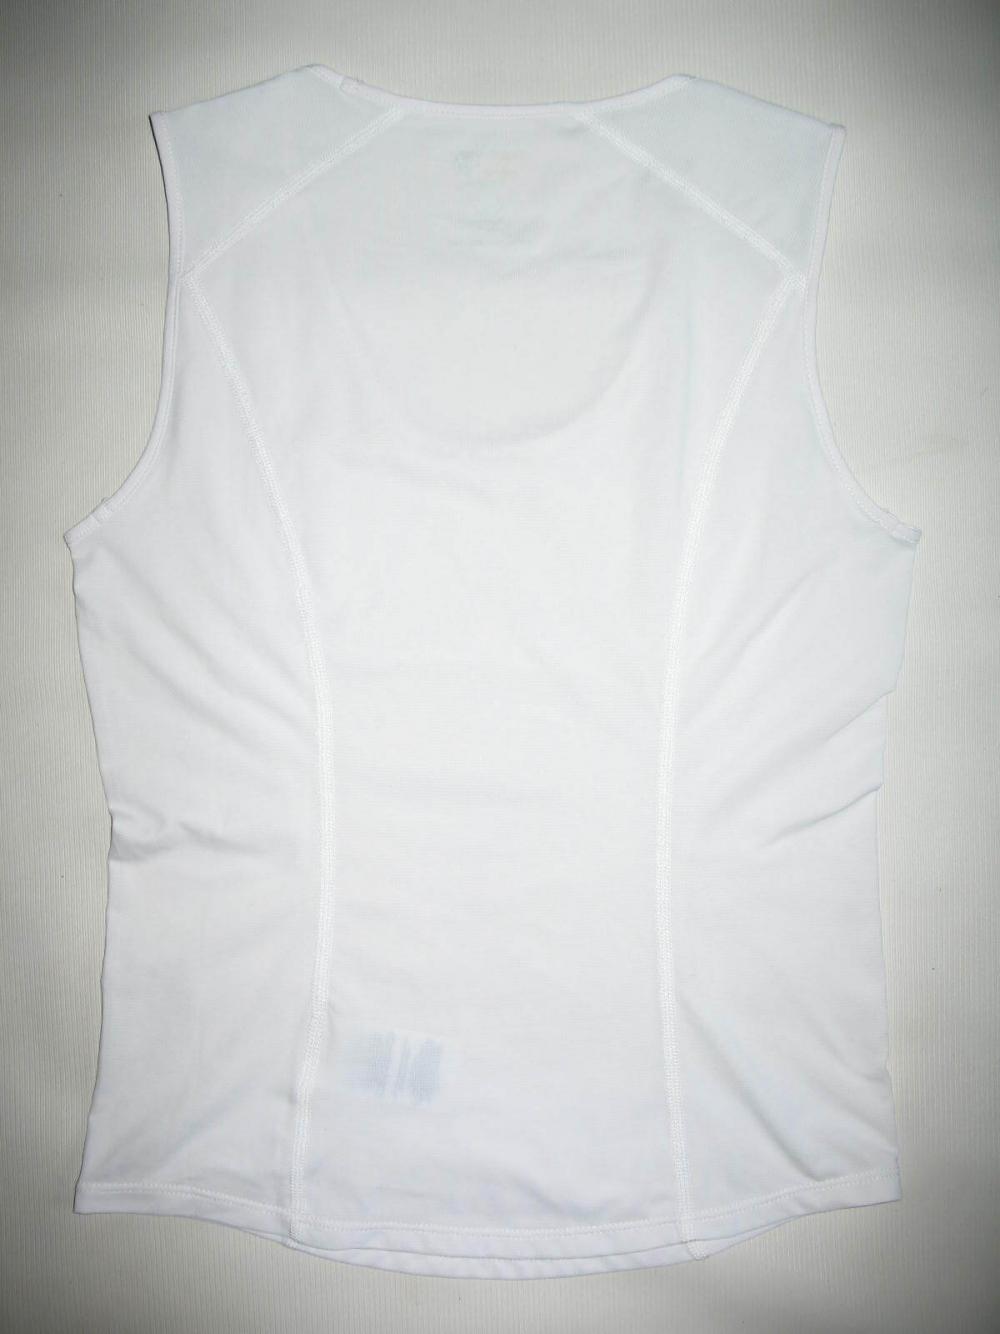 Футболка MOUNTAIN HARDWEAR Sleeveless Shirt lady (размер XS/S) - 1